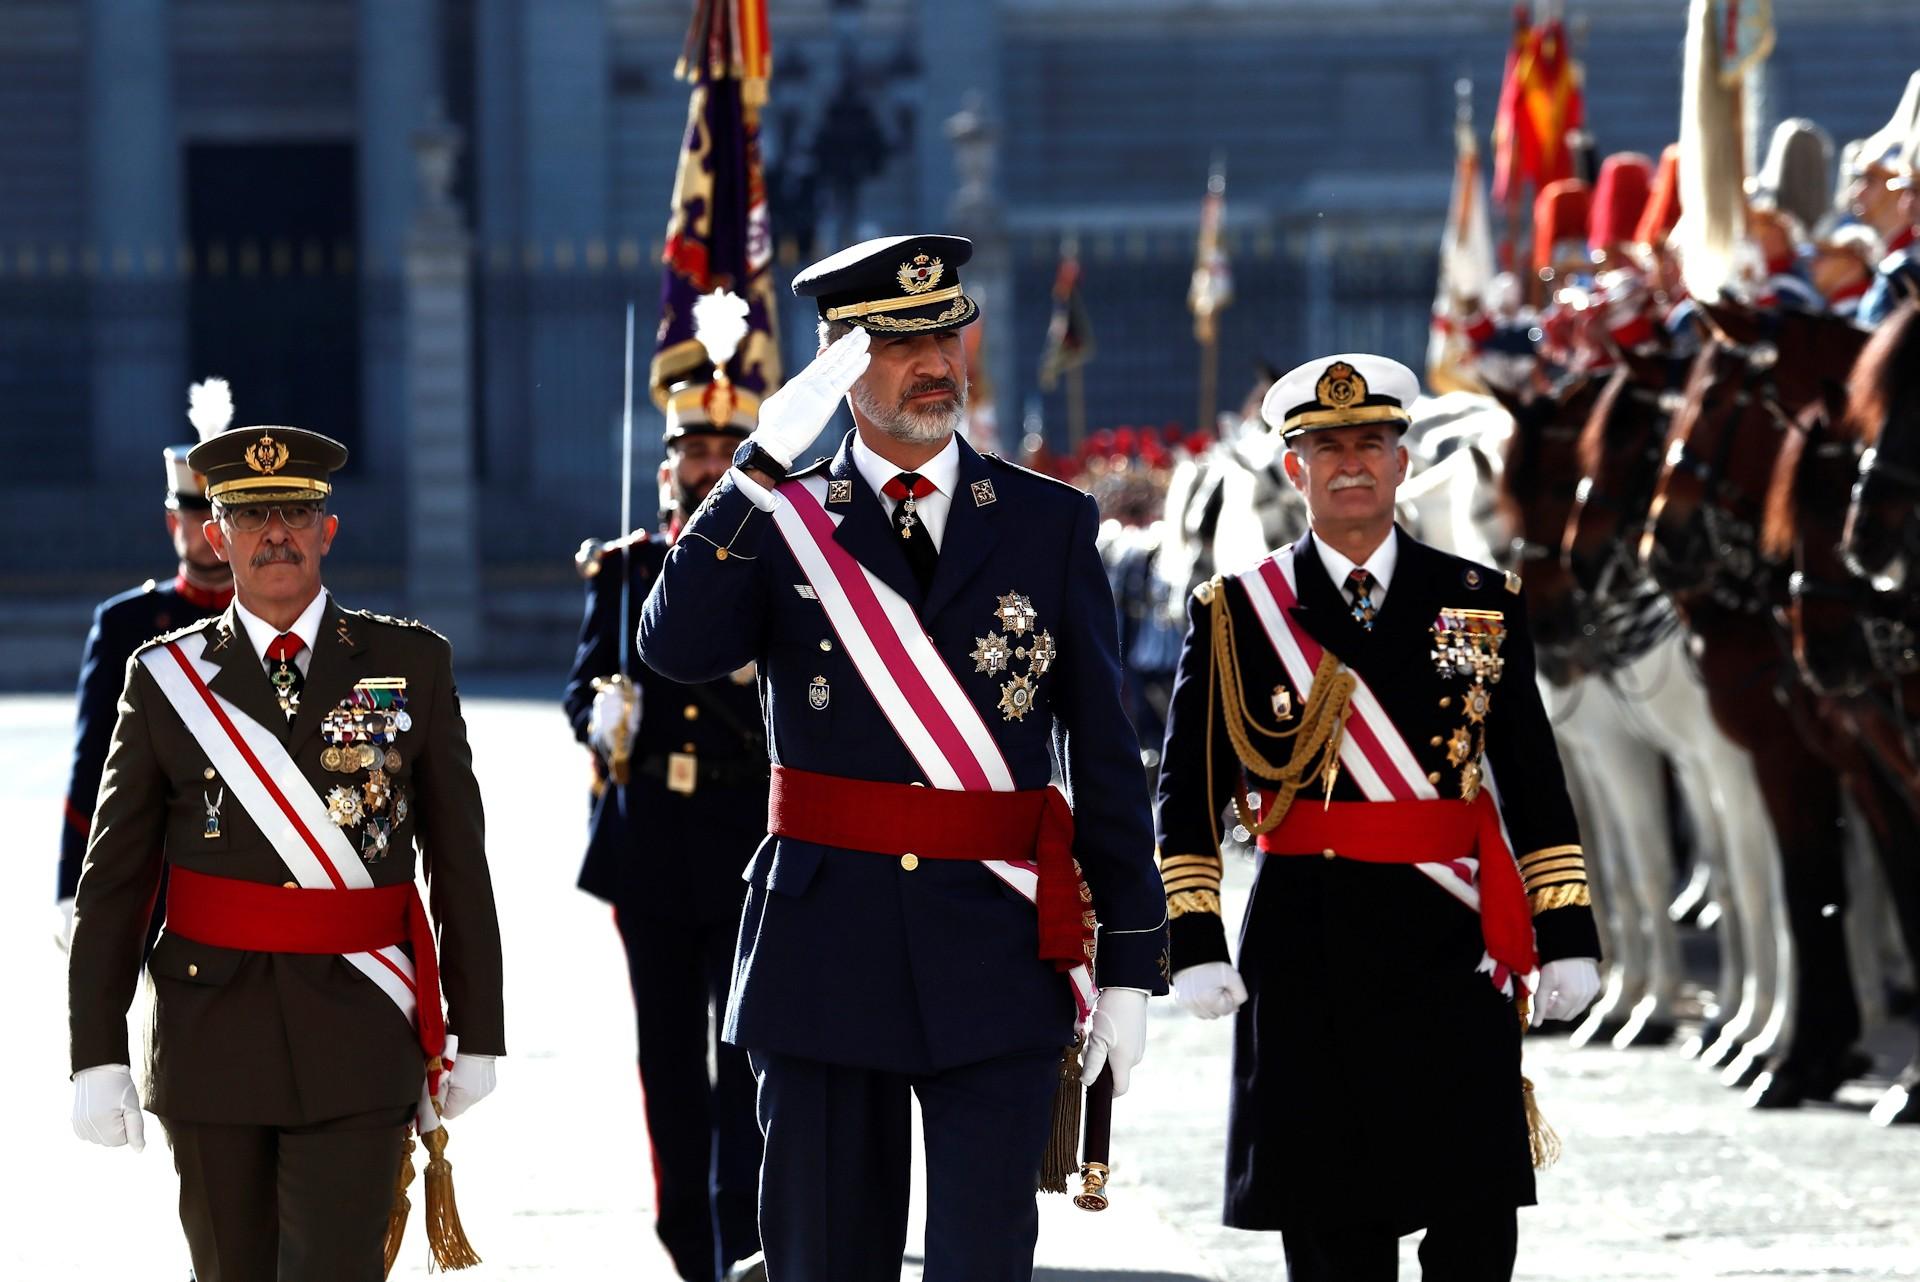 pascua-militar-felipe-vi-honores-guardia